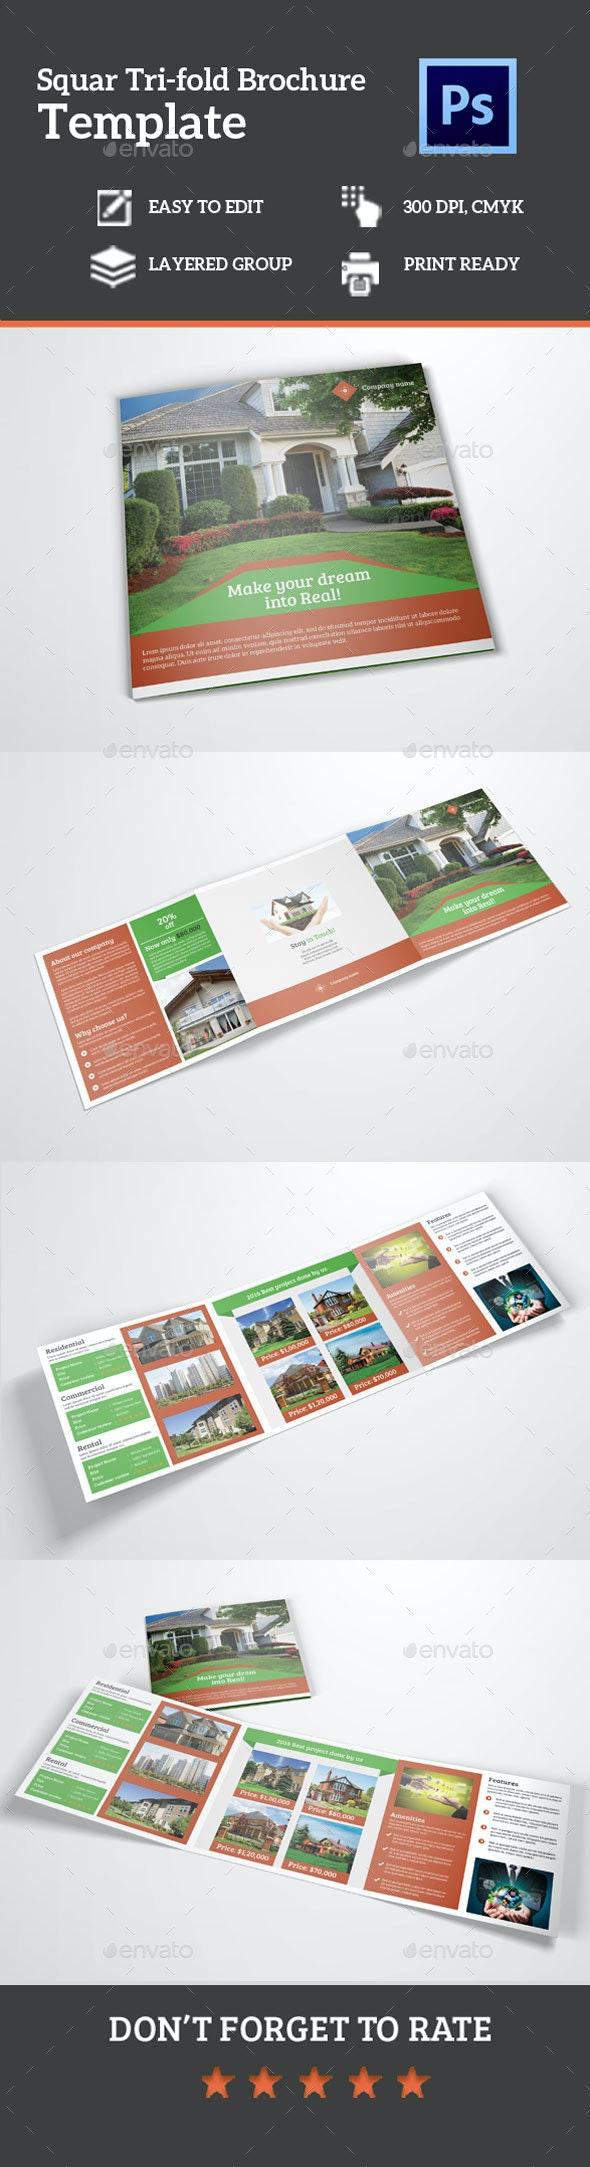 Square Tri-Fold Real Estate Brochure - Corporate Brochures